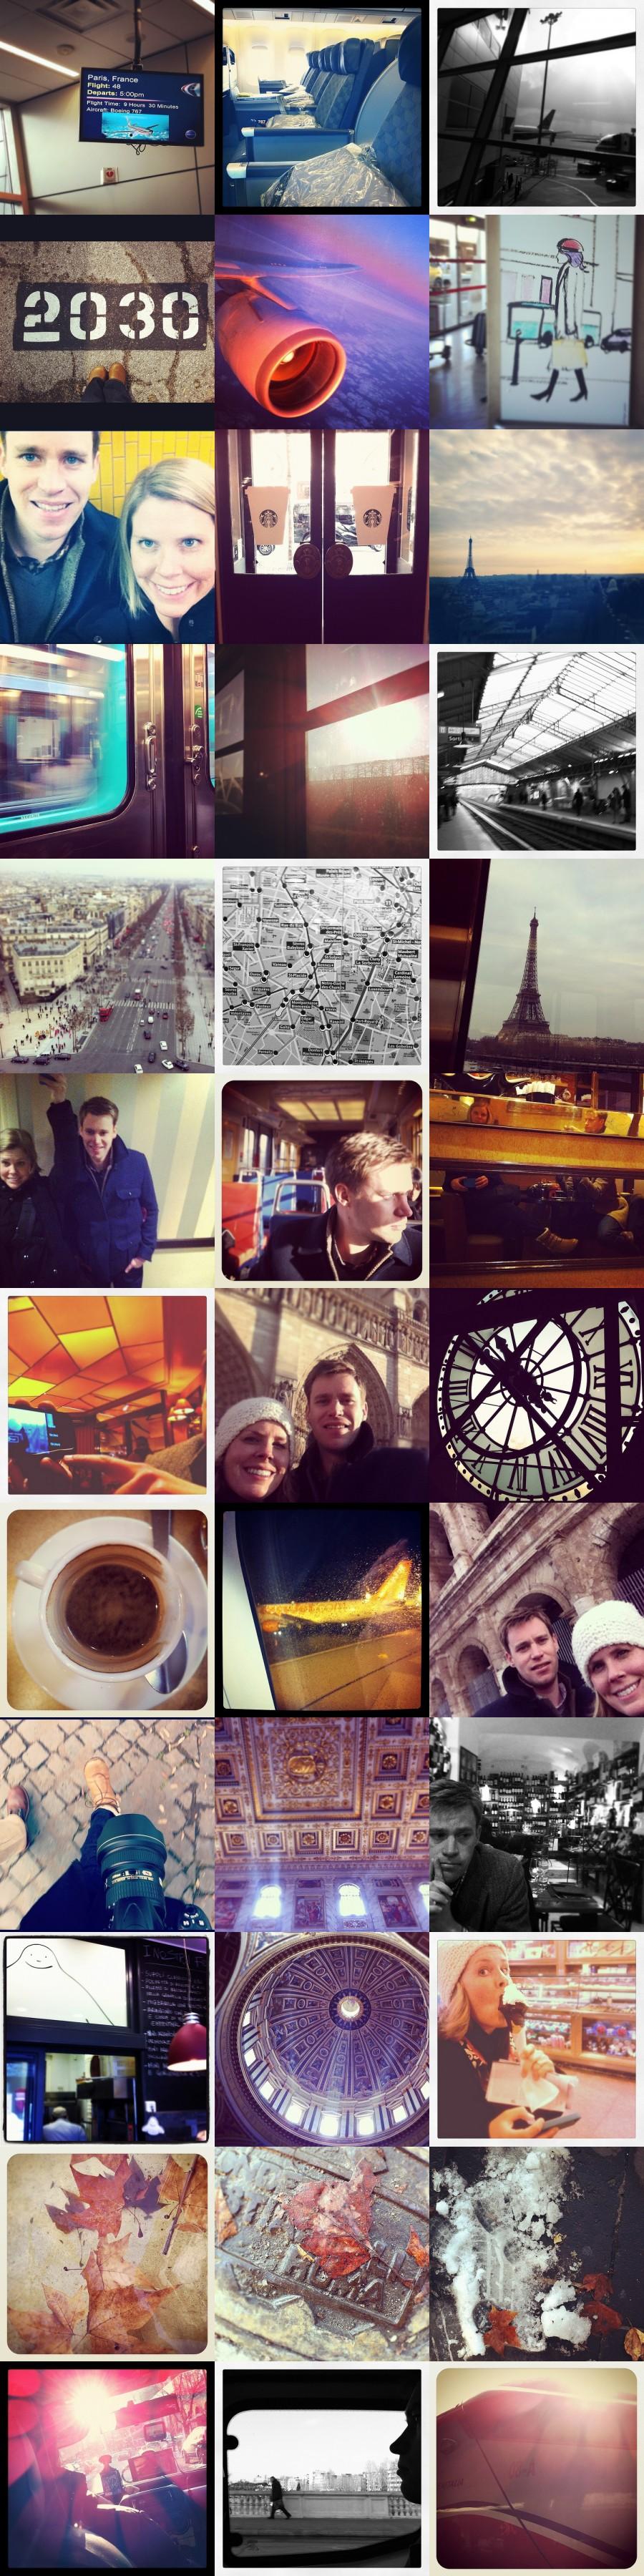 instagram_mosaic1